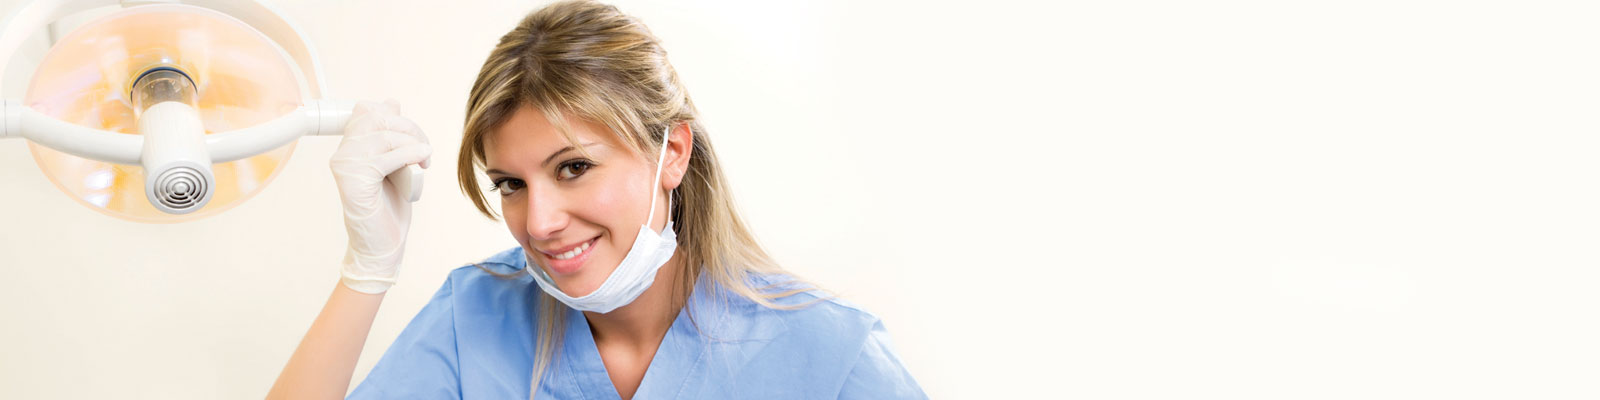 Dental Assistant Program In Louisville Ky Dental Assisting School